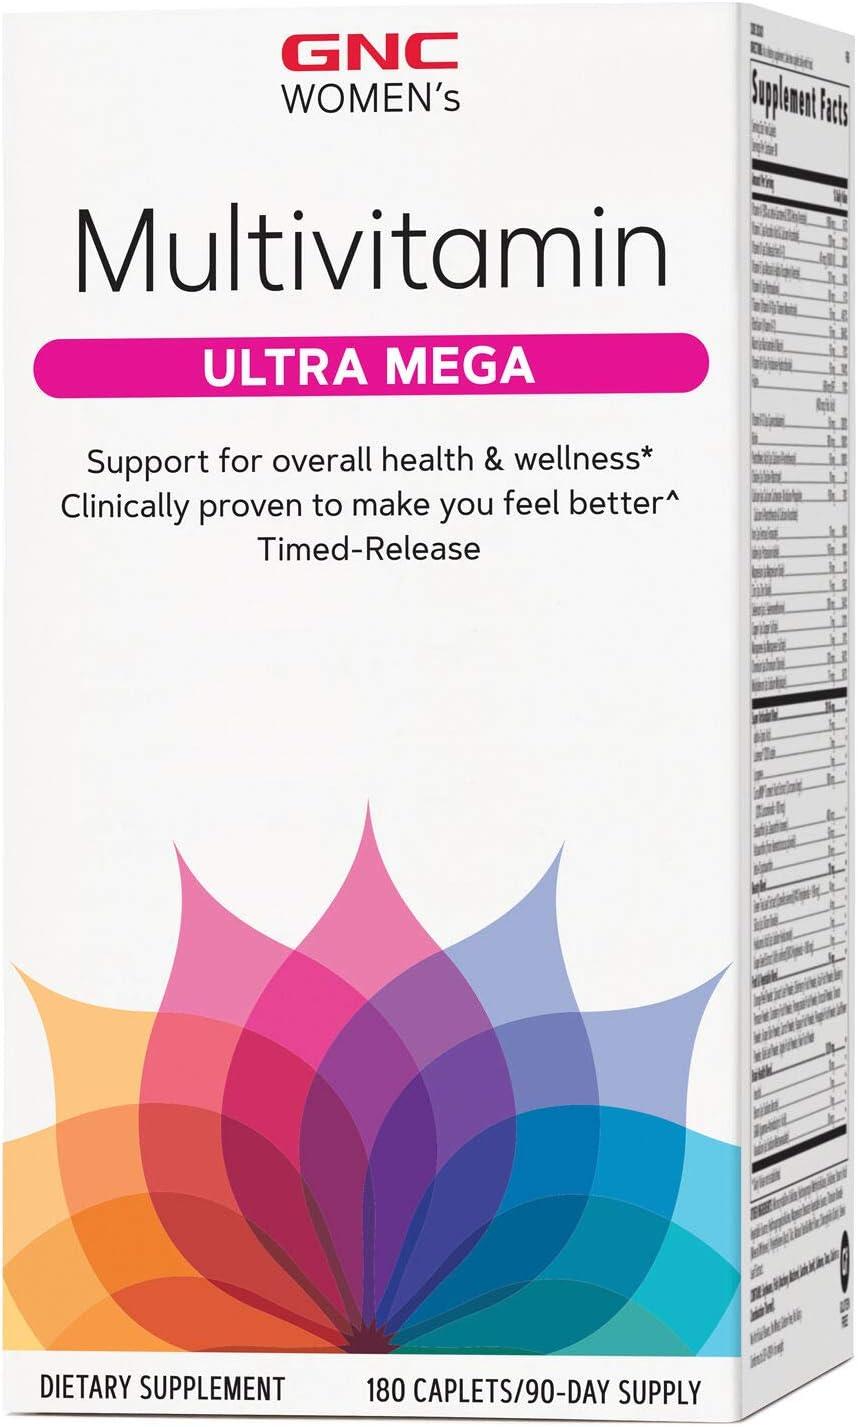 GNC Women's Multivitamin Ultra Mega, 180 Caplets, Support for Overall Health & Wellness